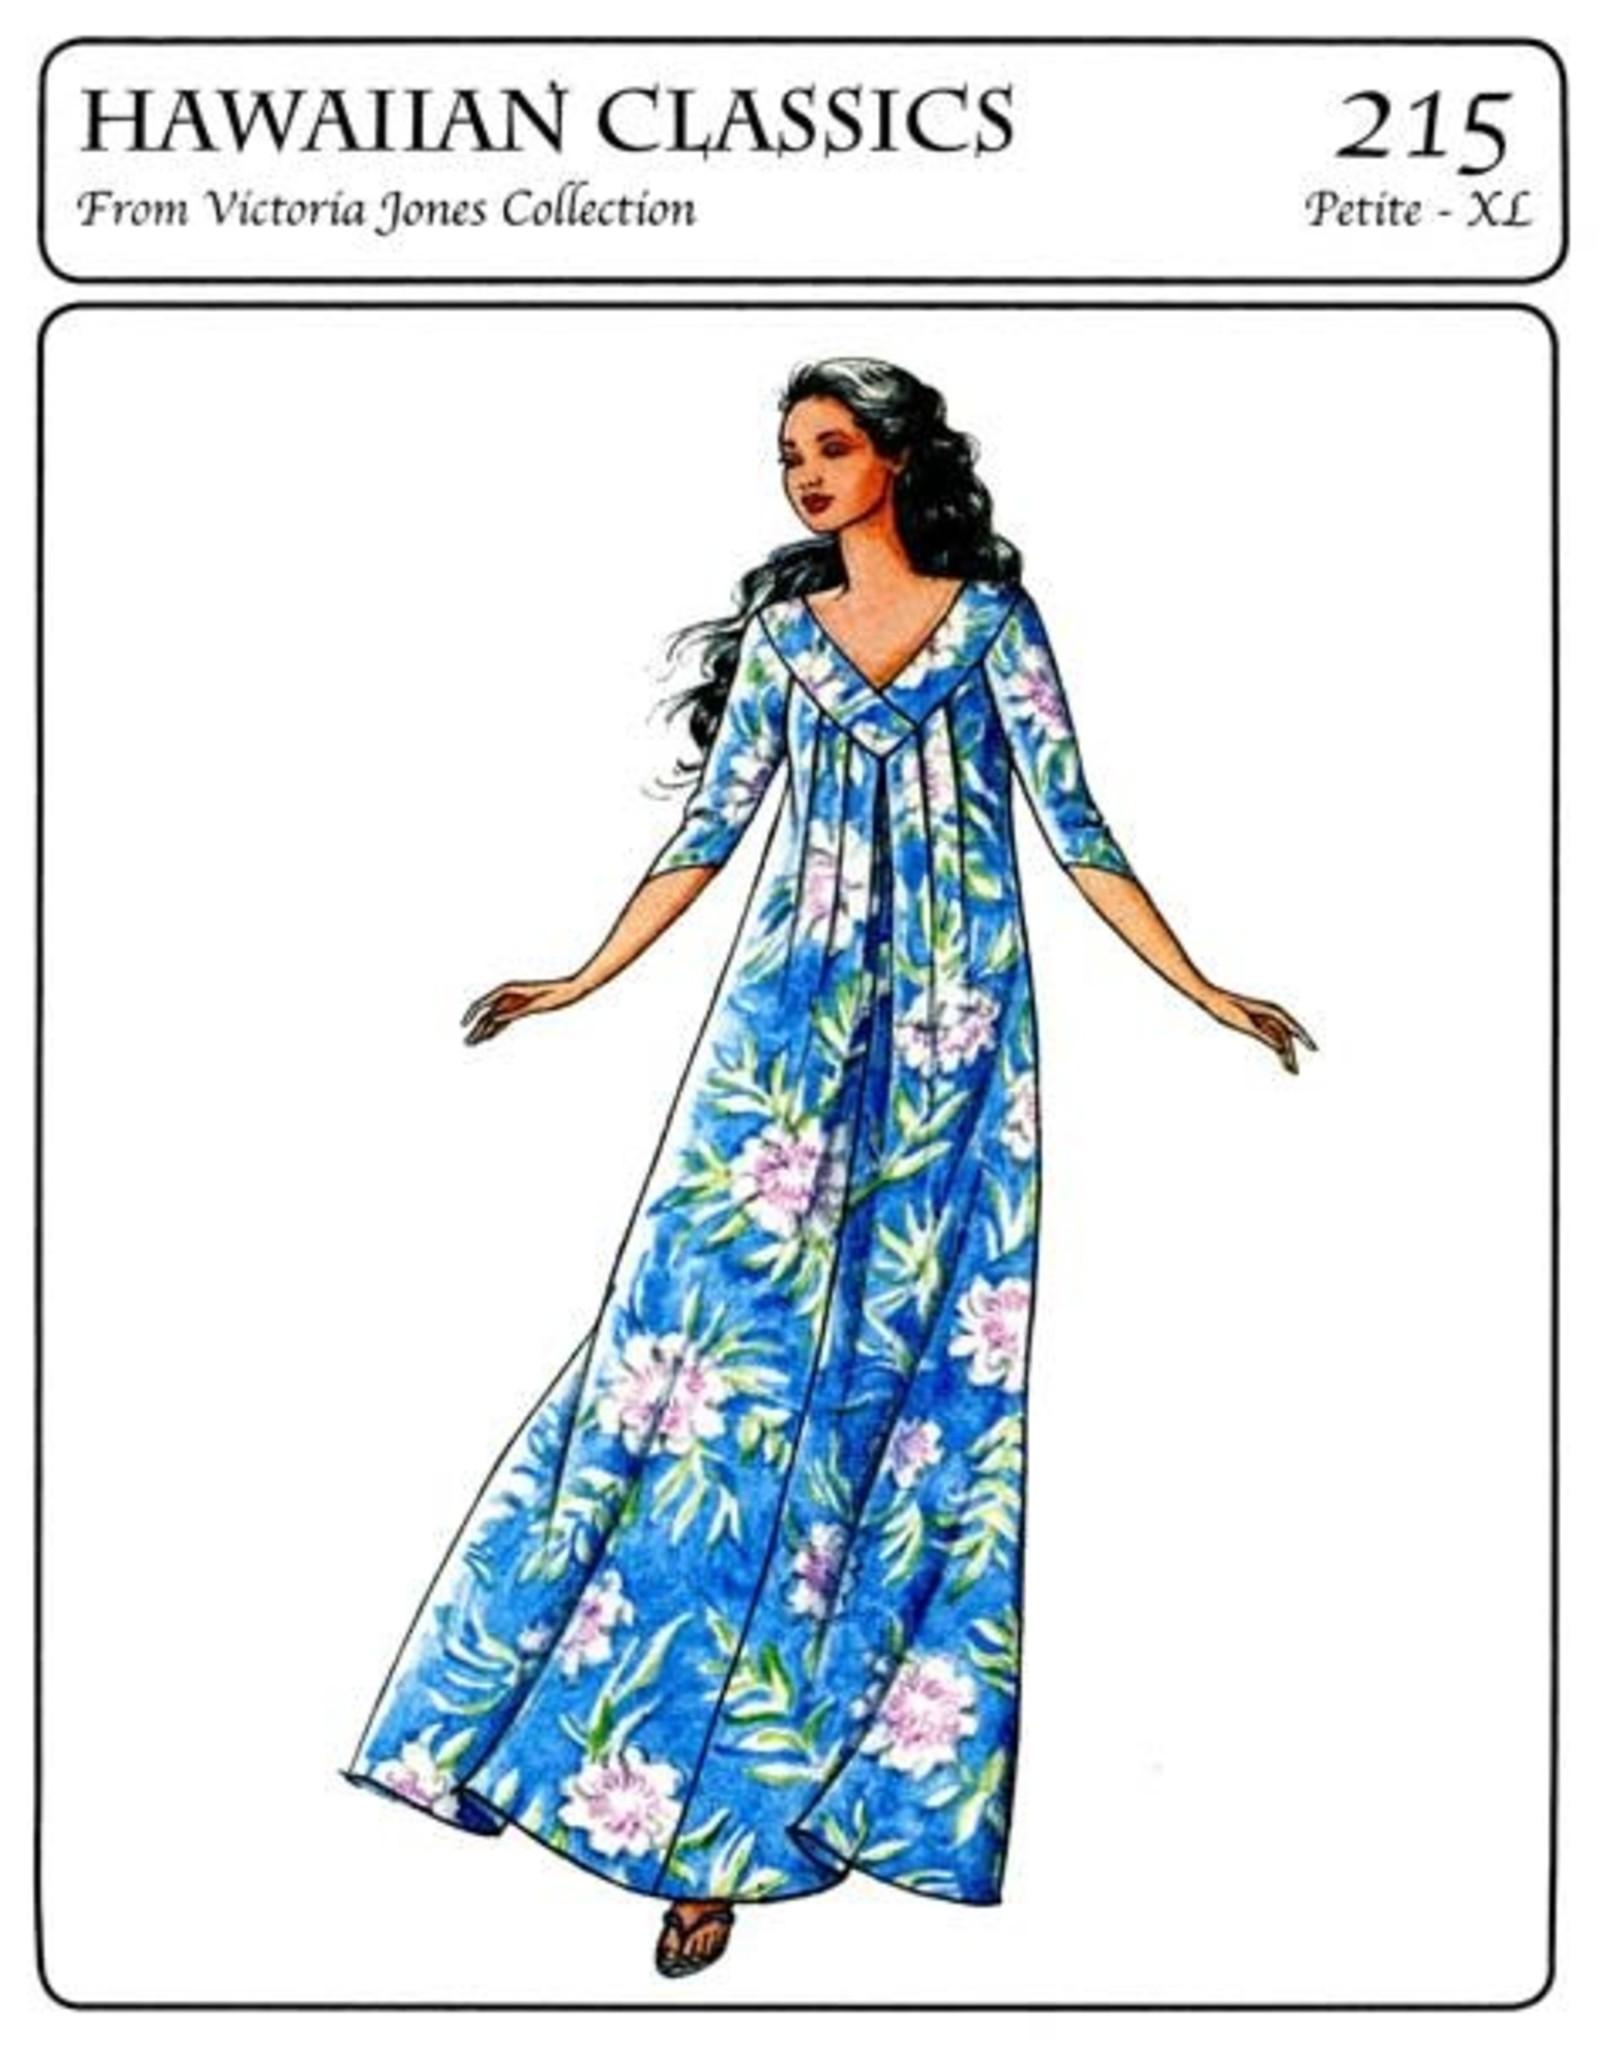 Victoria Jones Collection Hawaiian Classics, Misses Muumuu Sewing Pattern